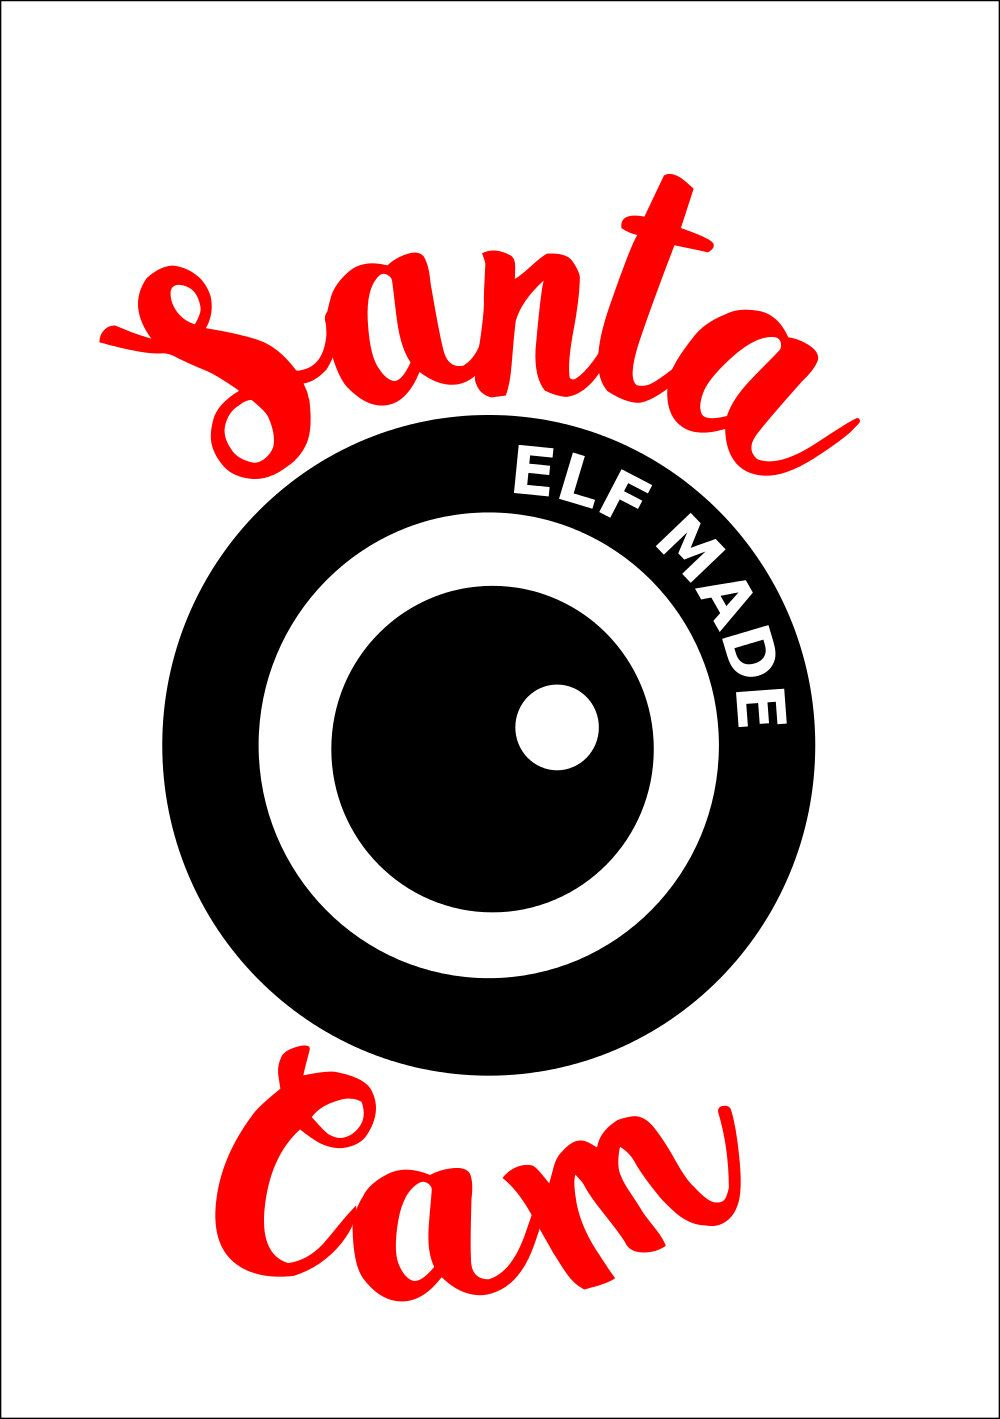 Svg Christmas Santa Cam Svg Dxf Pdf Cuttable File Santa Etsy In 2020 Santa Cam Silhouette Christmas Vinyl Ornaments